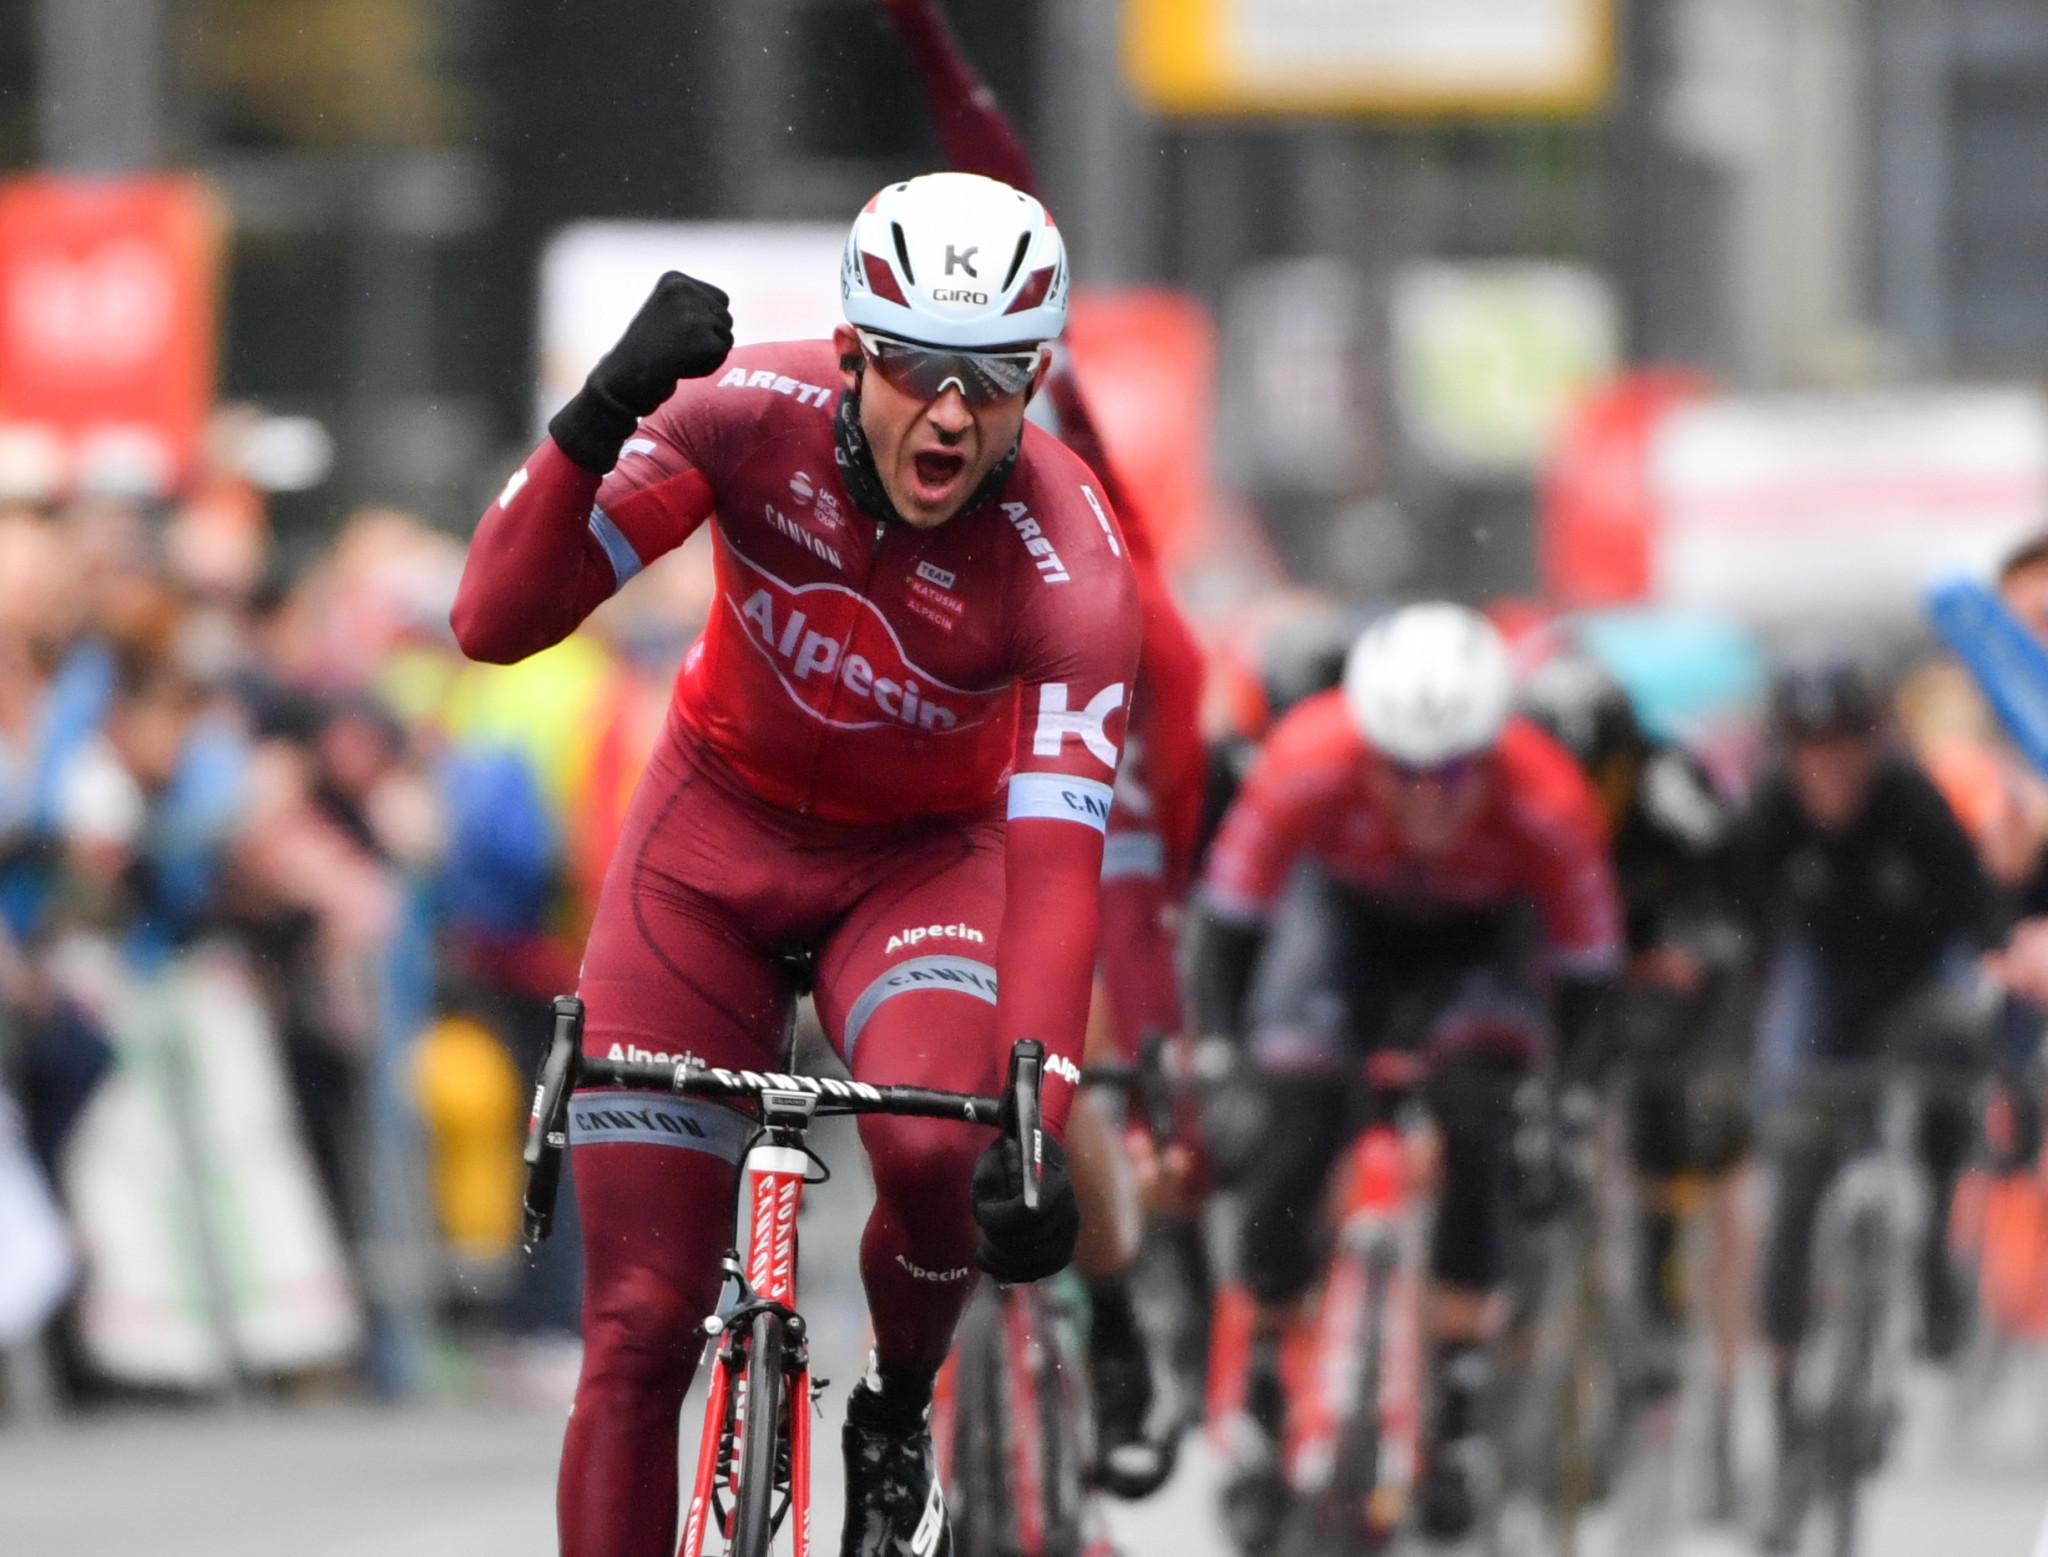 UCI announces amendments to WorldTour calendar amid COVID-19 postponements